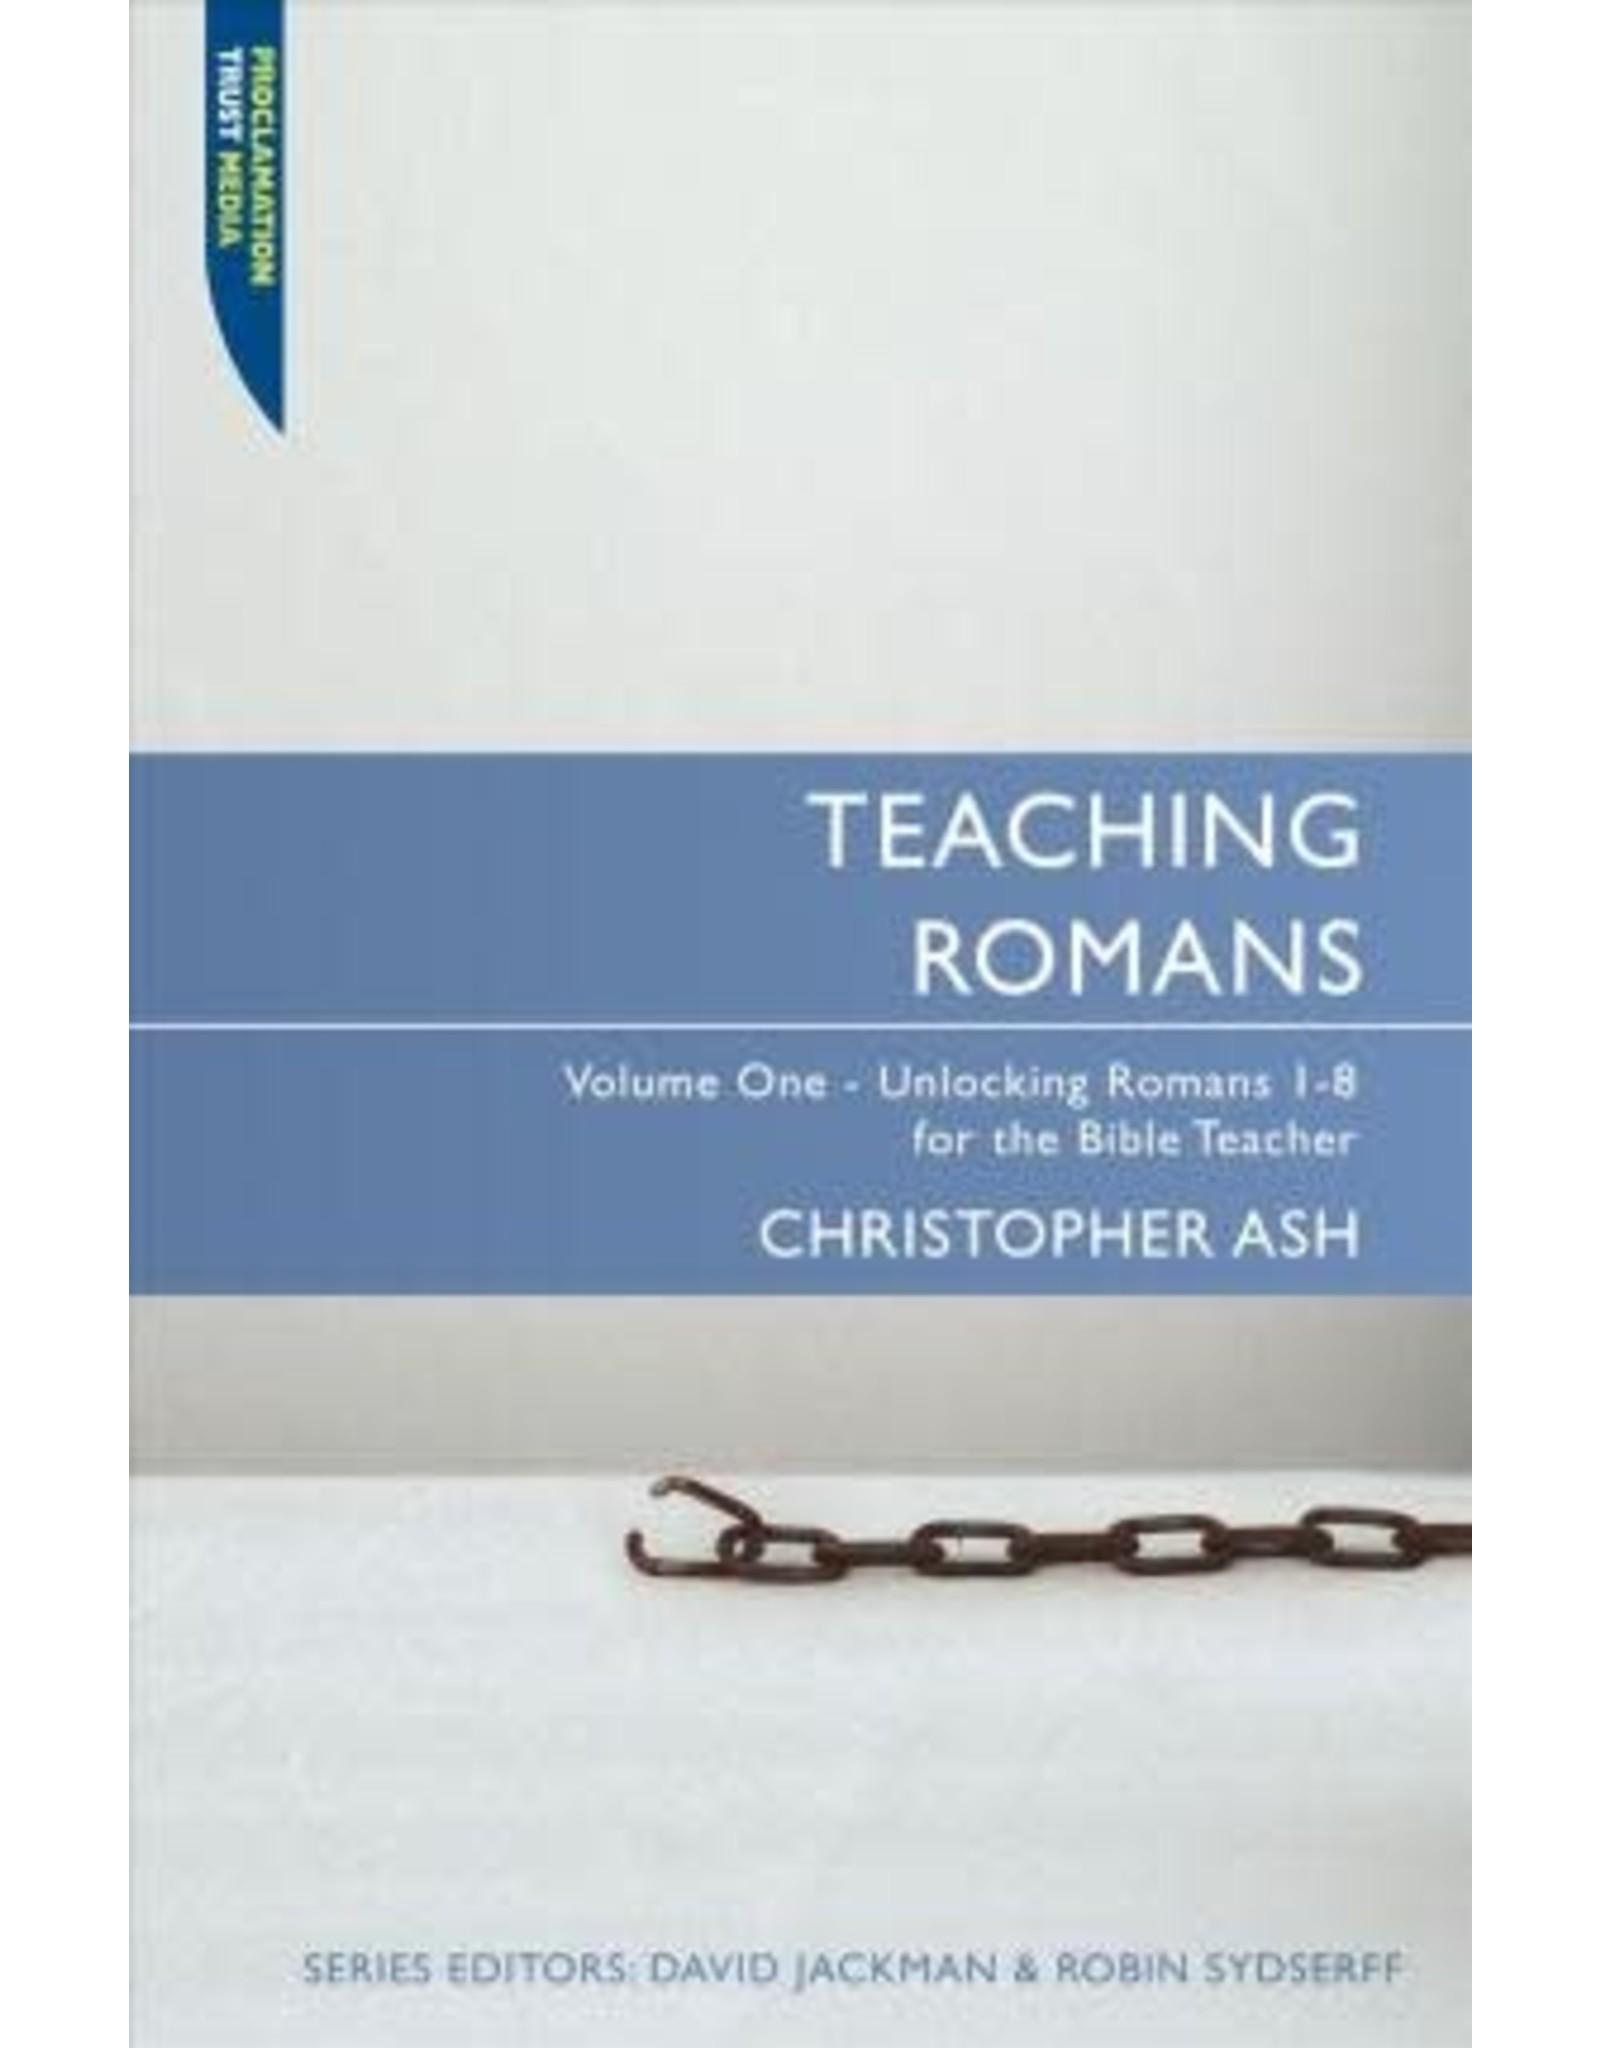 Ash Teaching Romans, Volume One